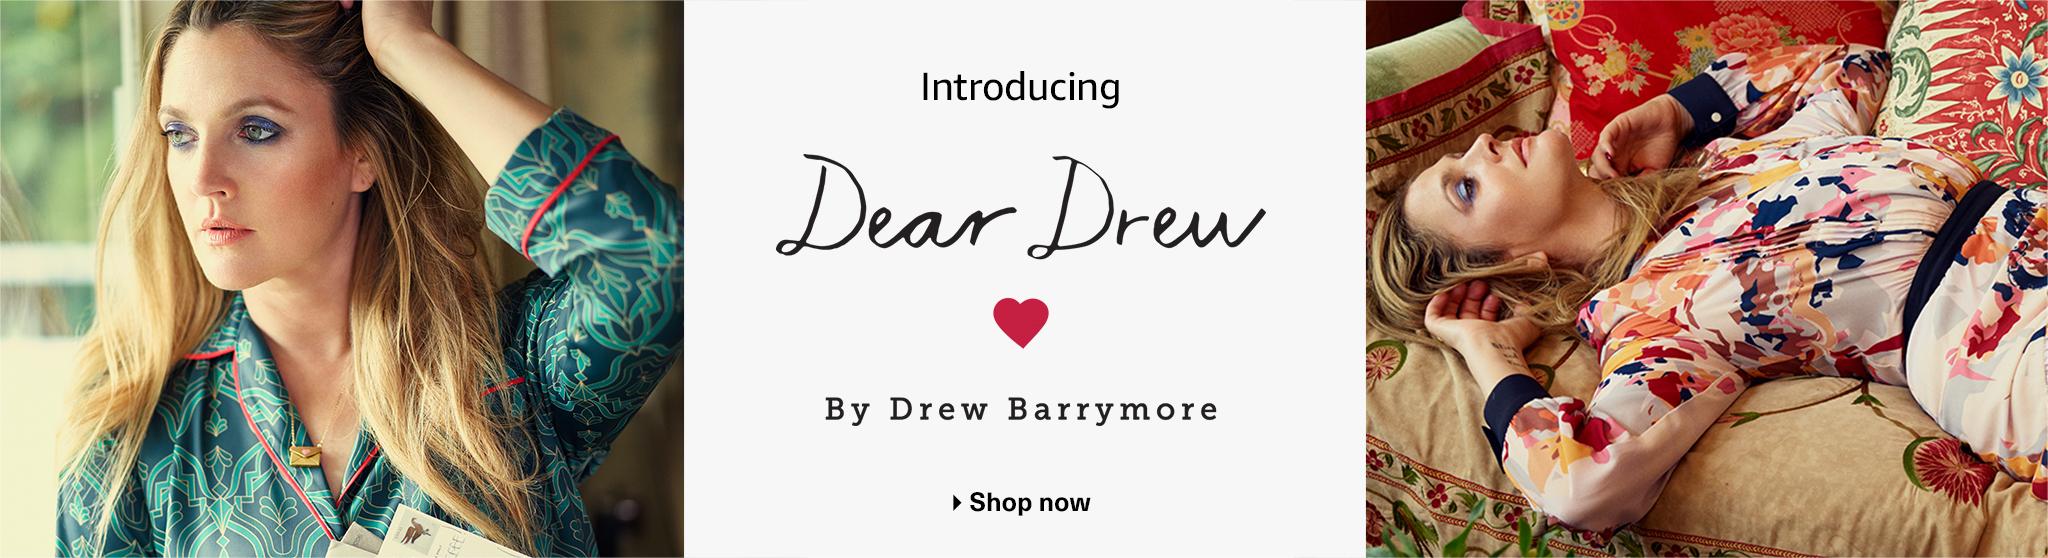 Introducing Dear Drew by Drew Barrymore